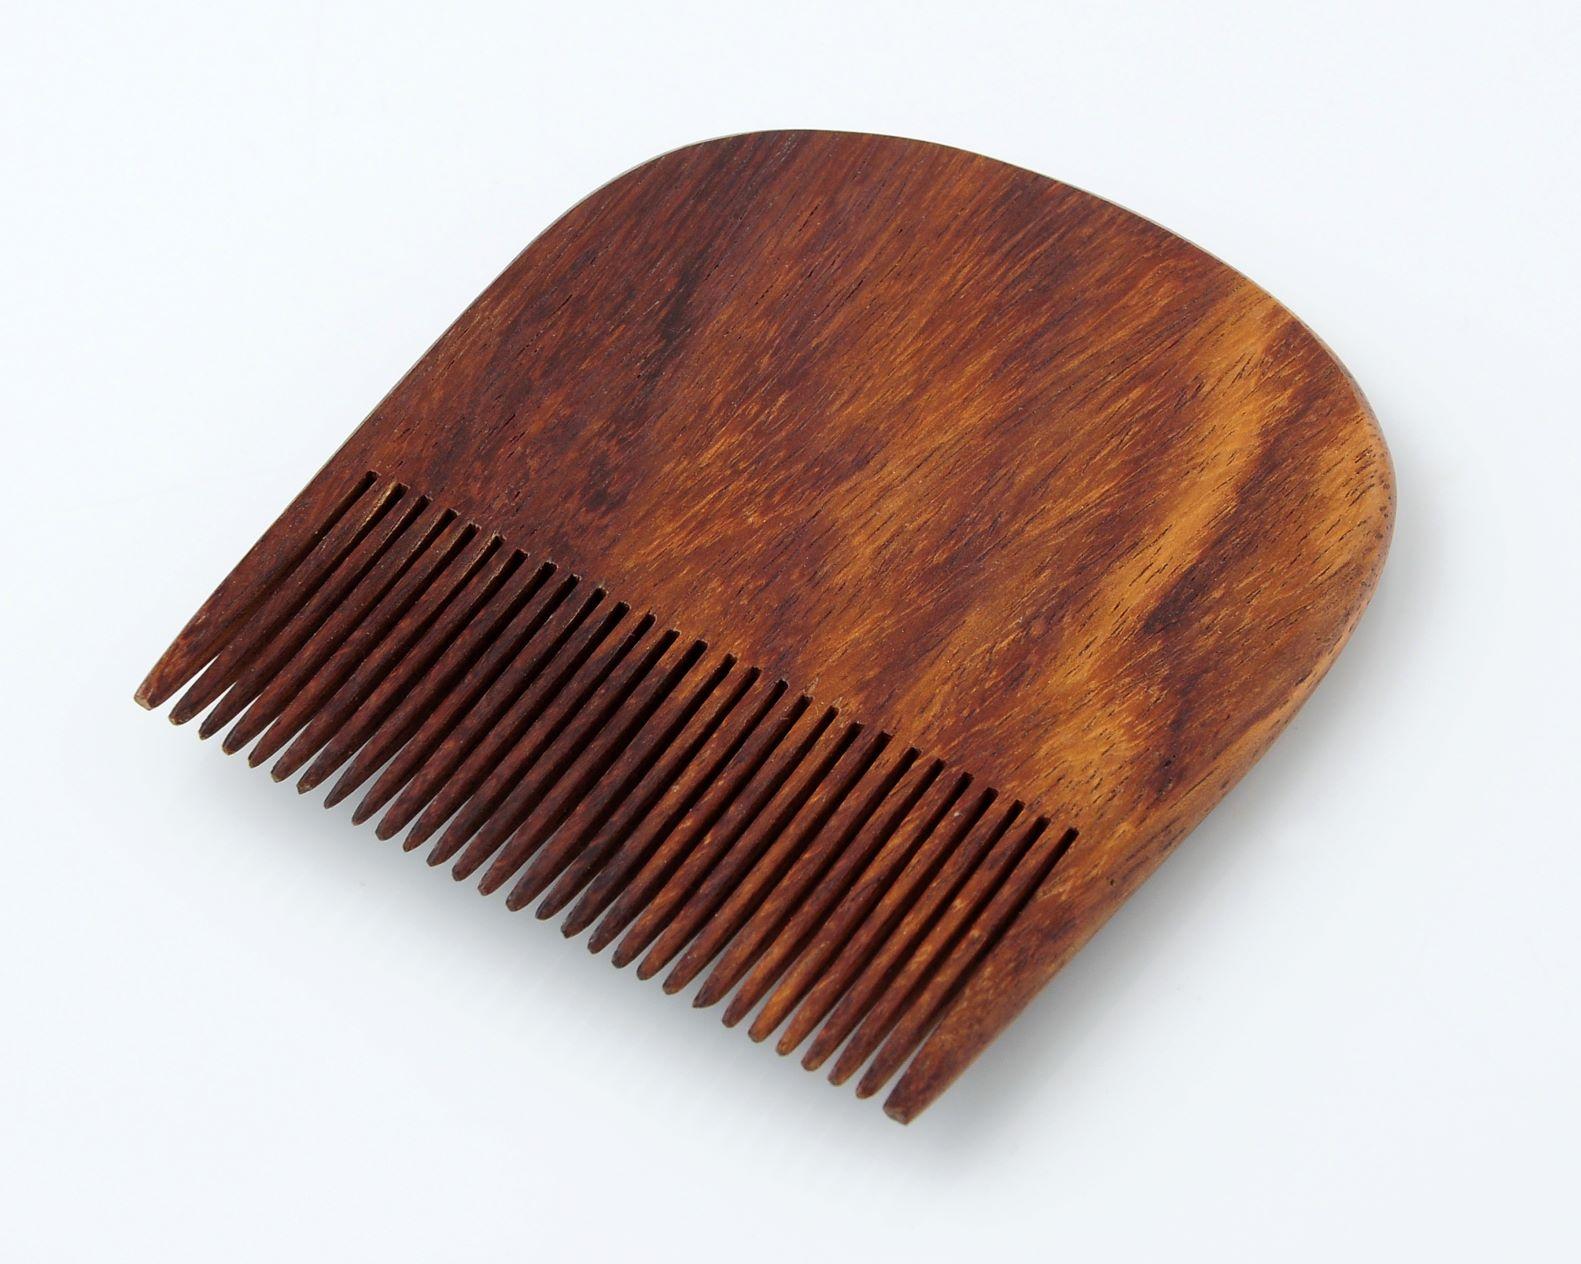 Hřeben na vousy Gaira 409-11